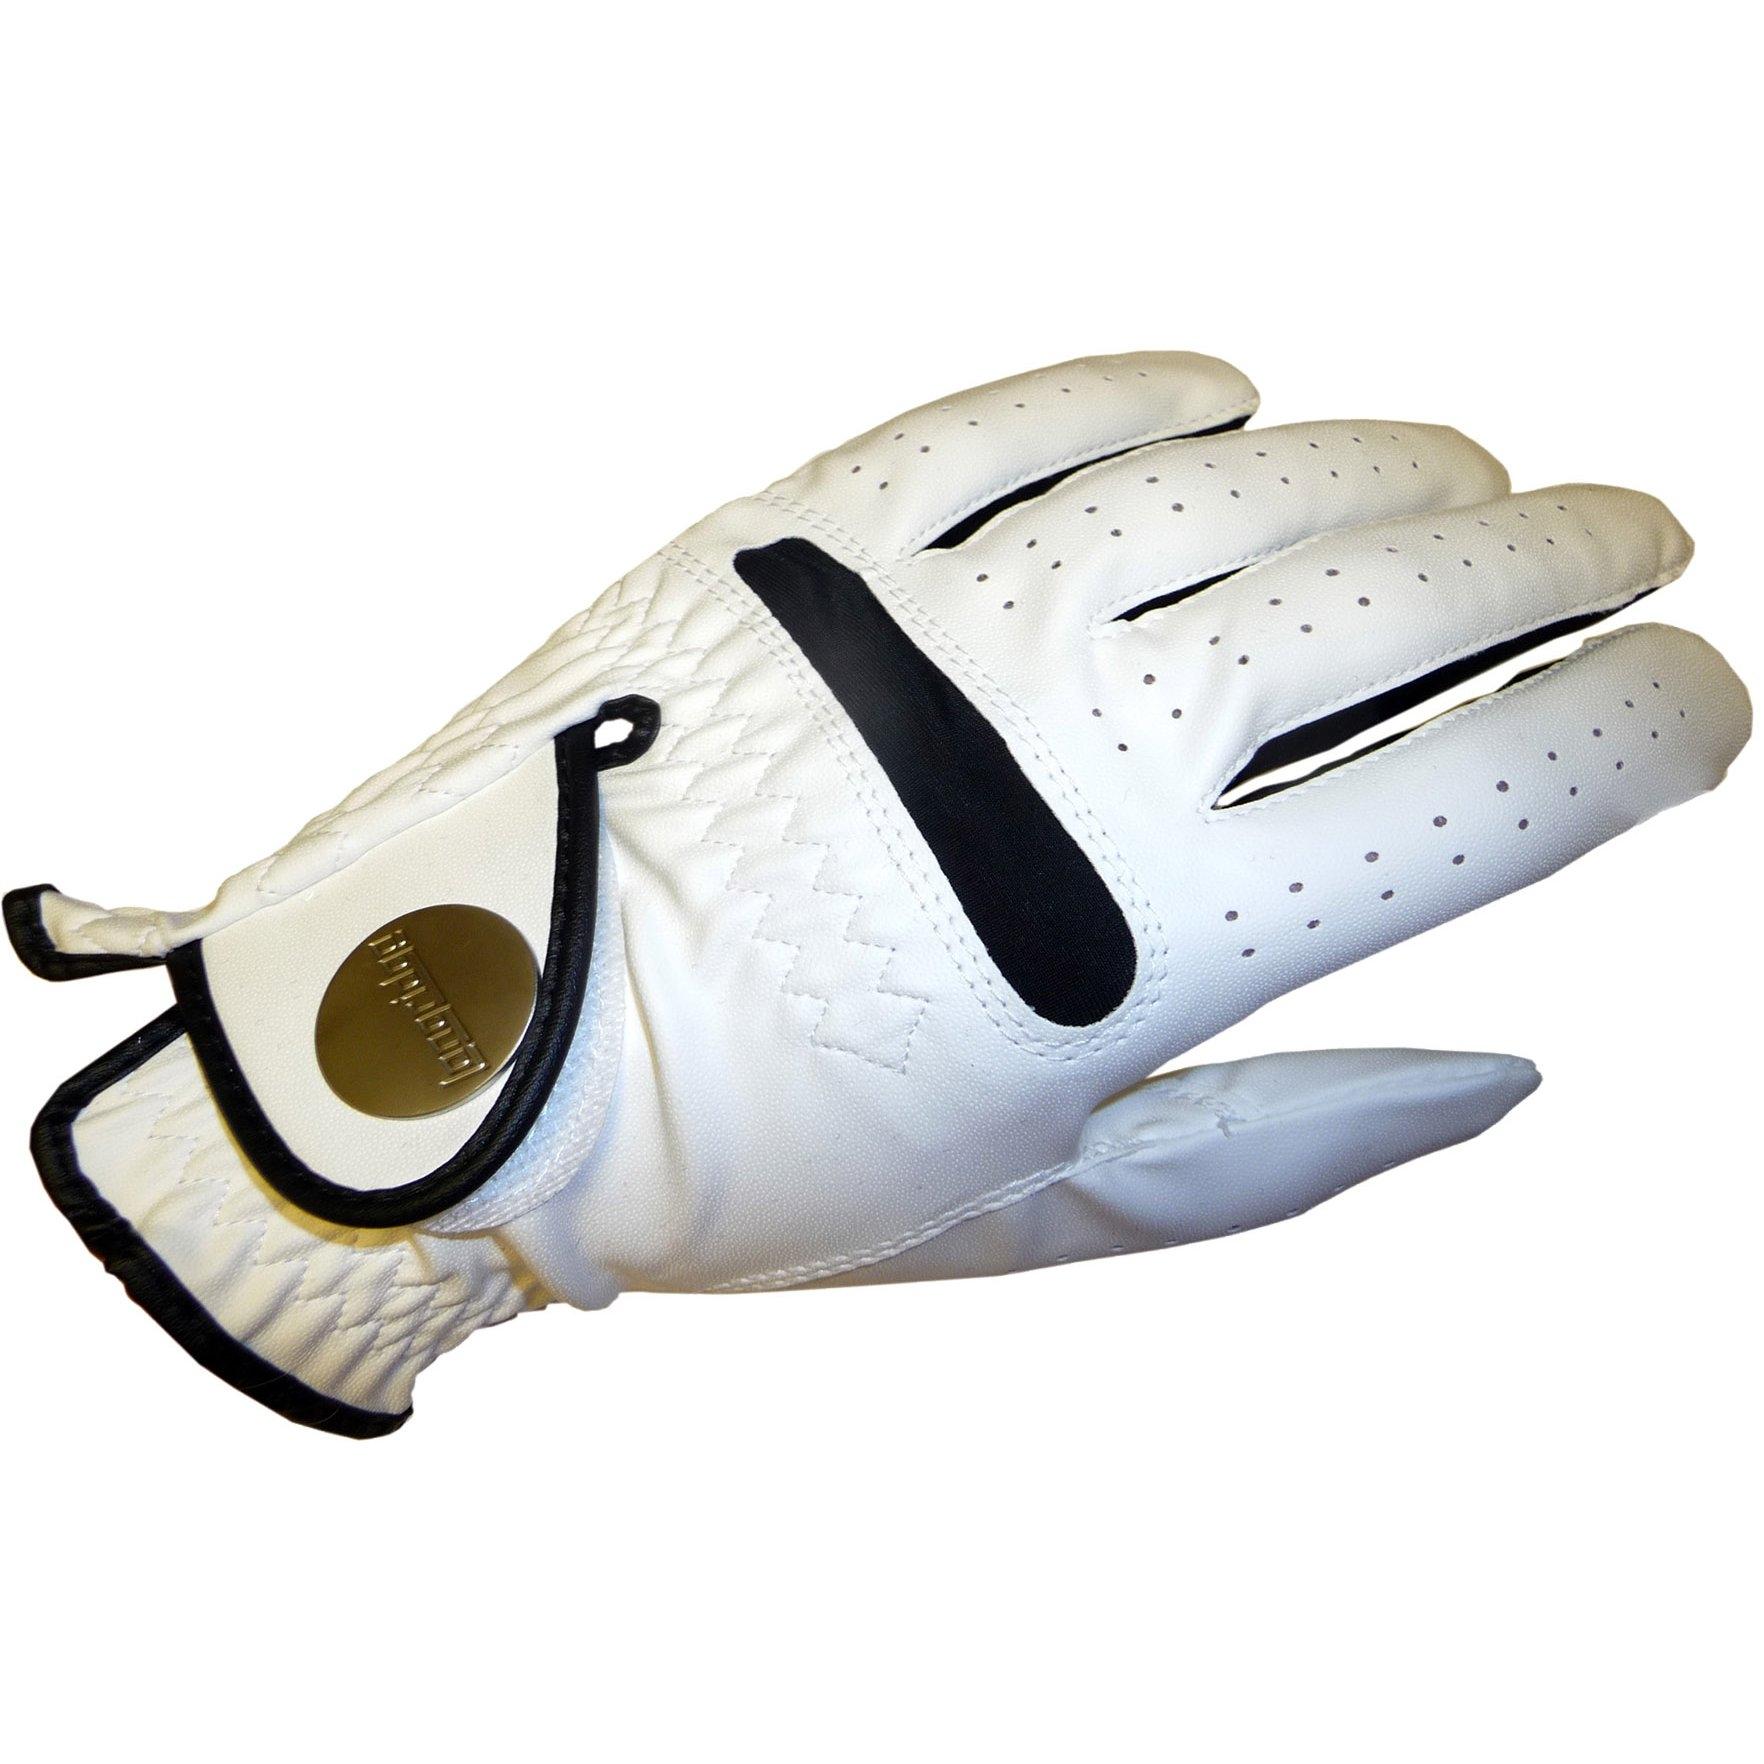 Longridge Evo Tour All Weather Golf Glove - Ladies LH - M